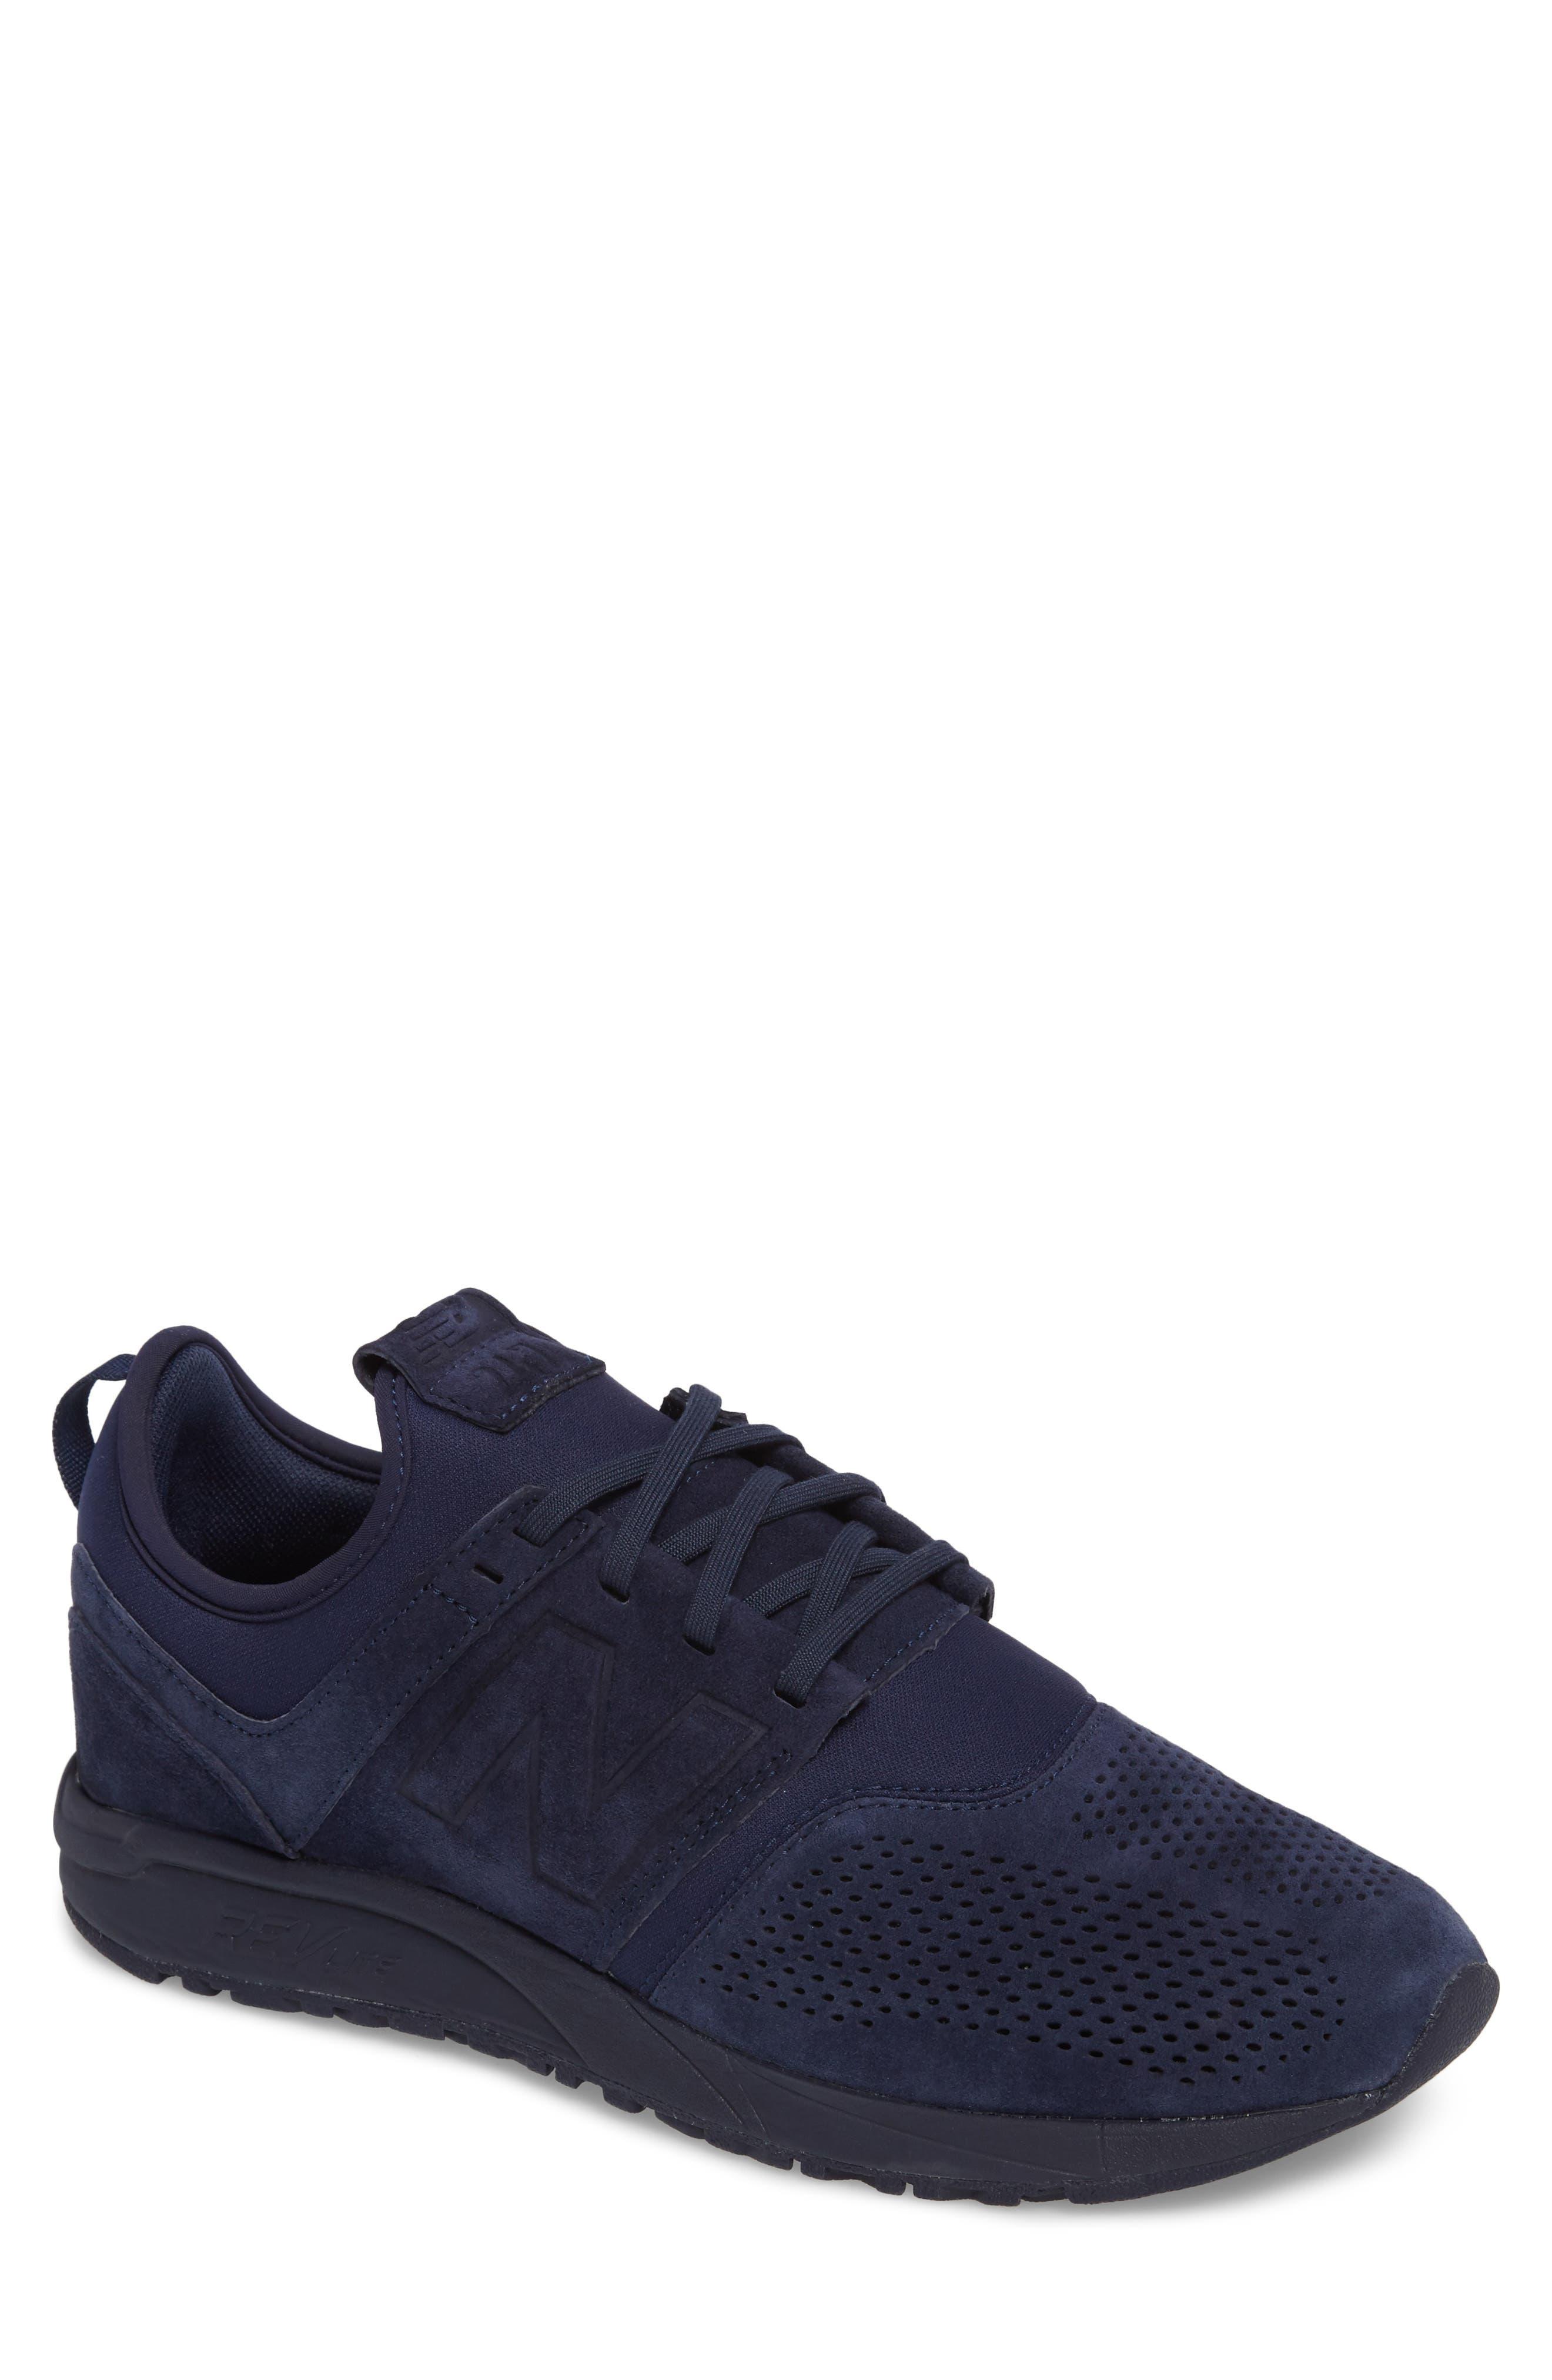 New Balance MRL247 Sneaker (Men)